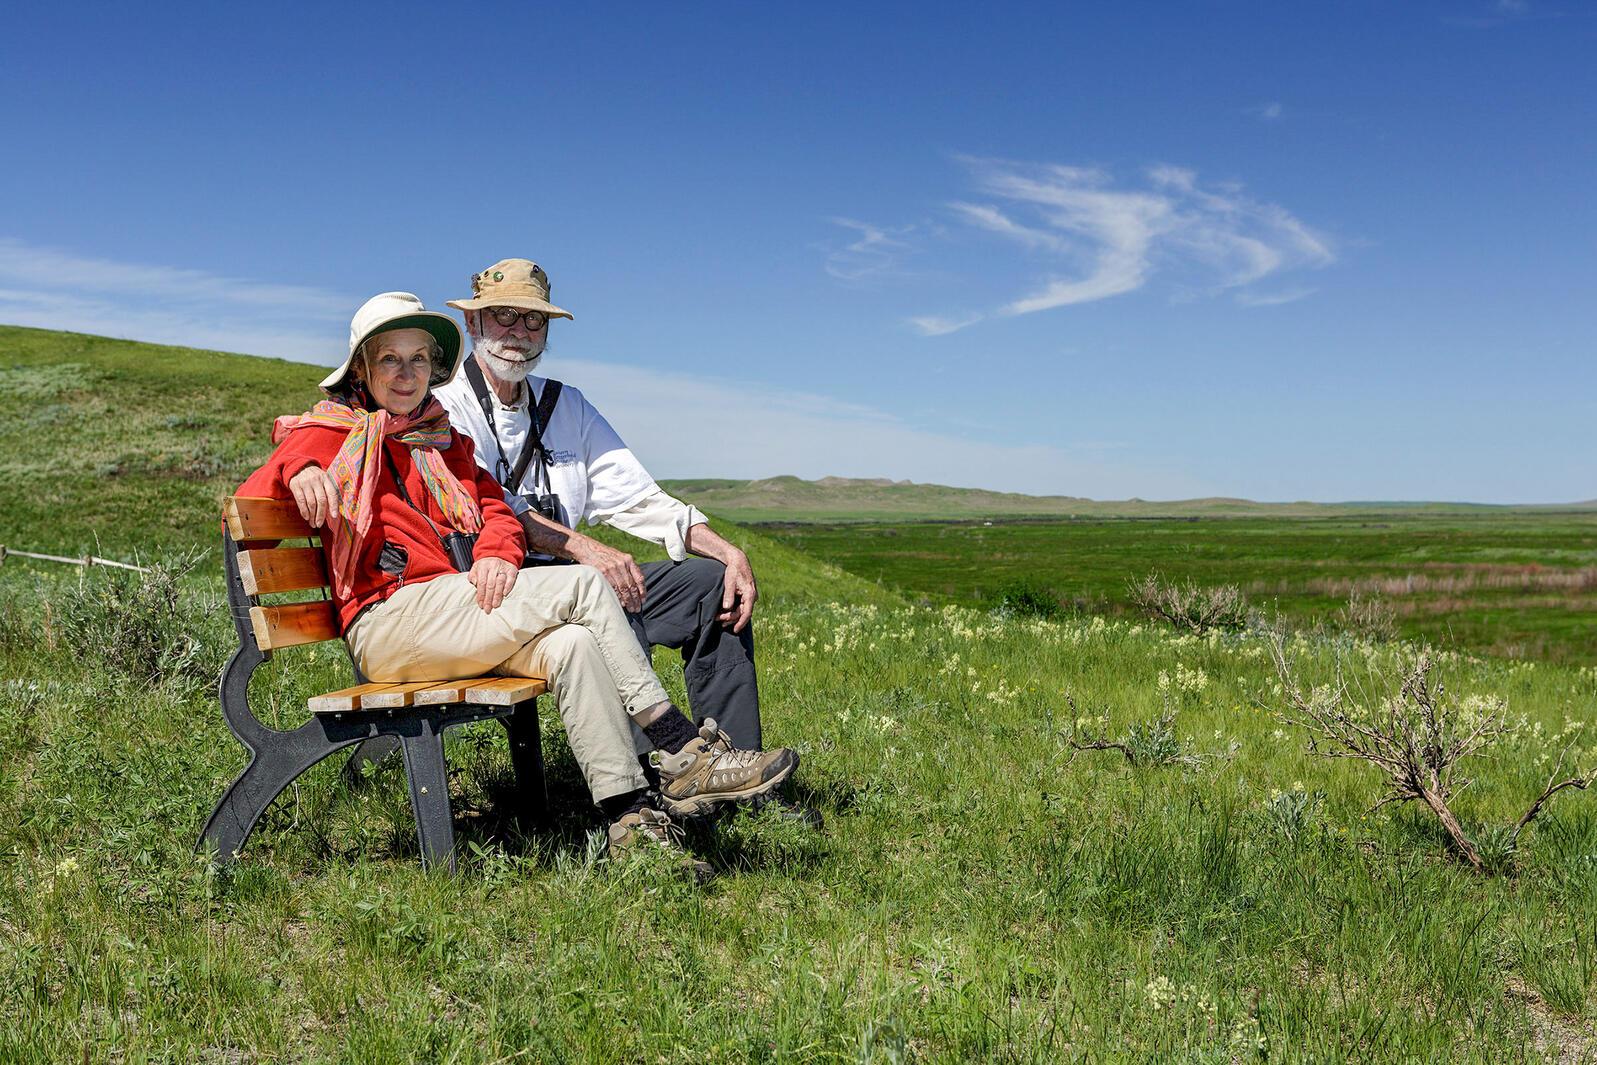 Margaret Atwood and Graeme Gibson in Grasslands National Park, Saskatchewan. Branimir Gjetvaj